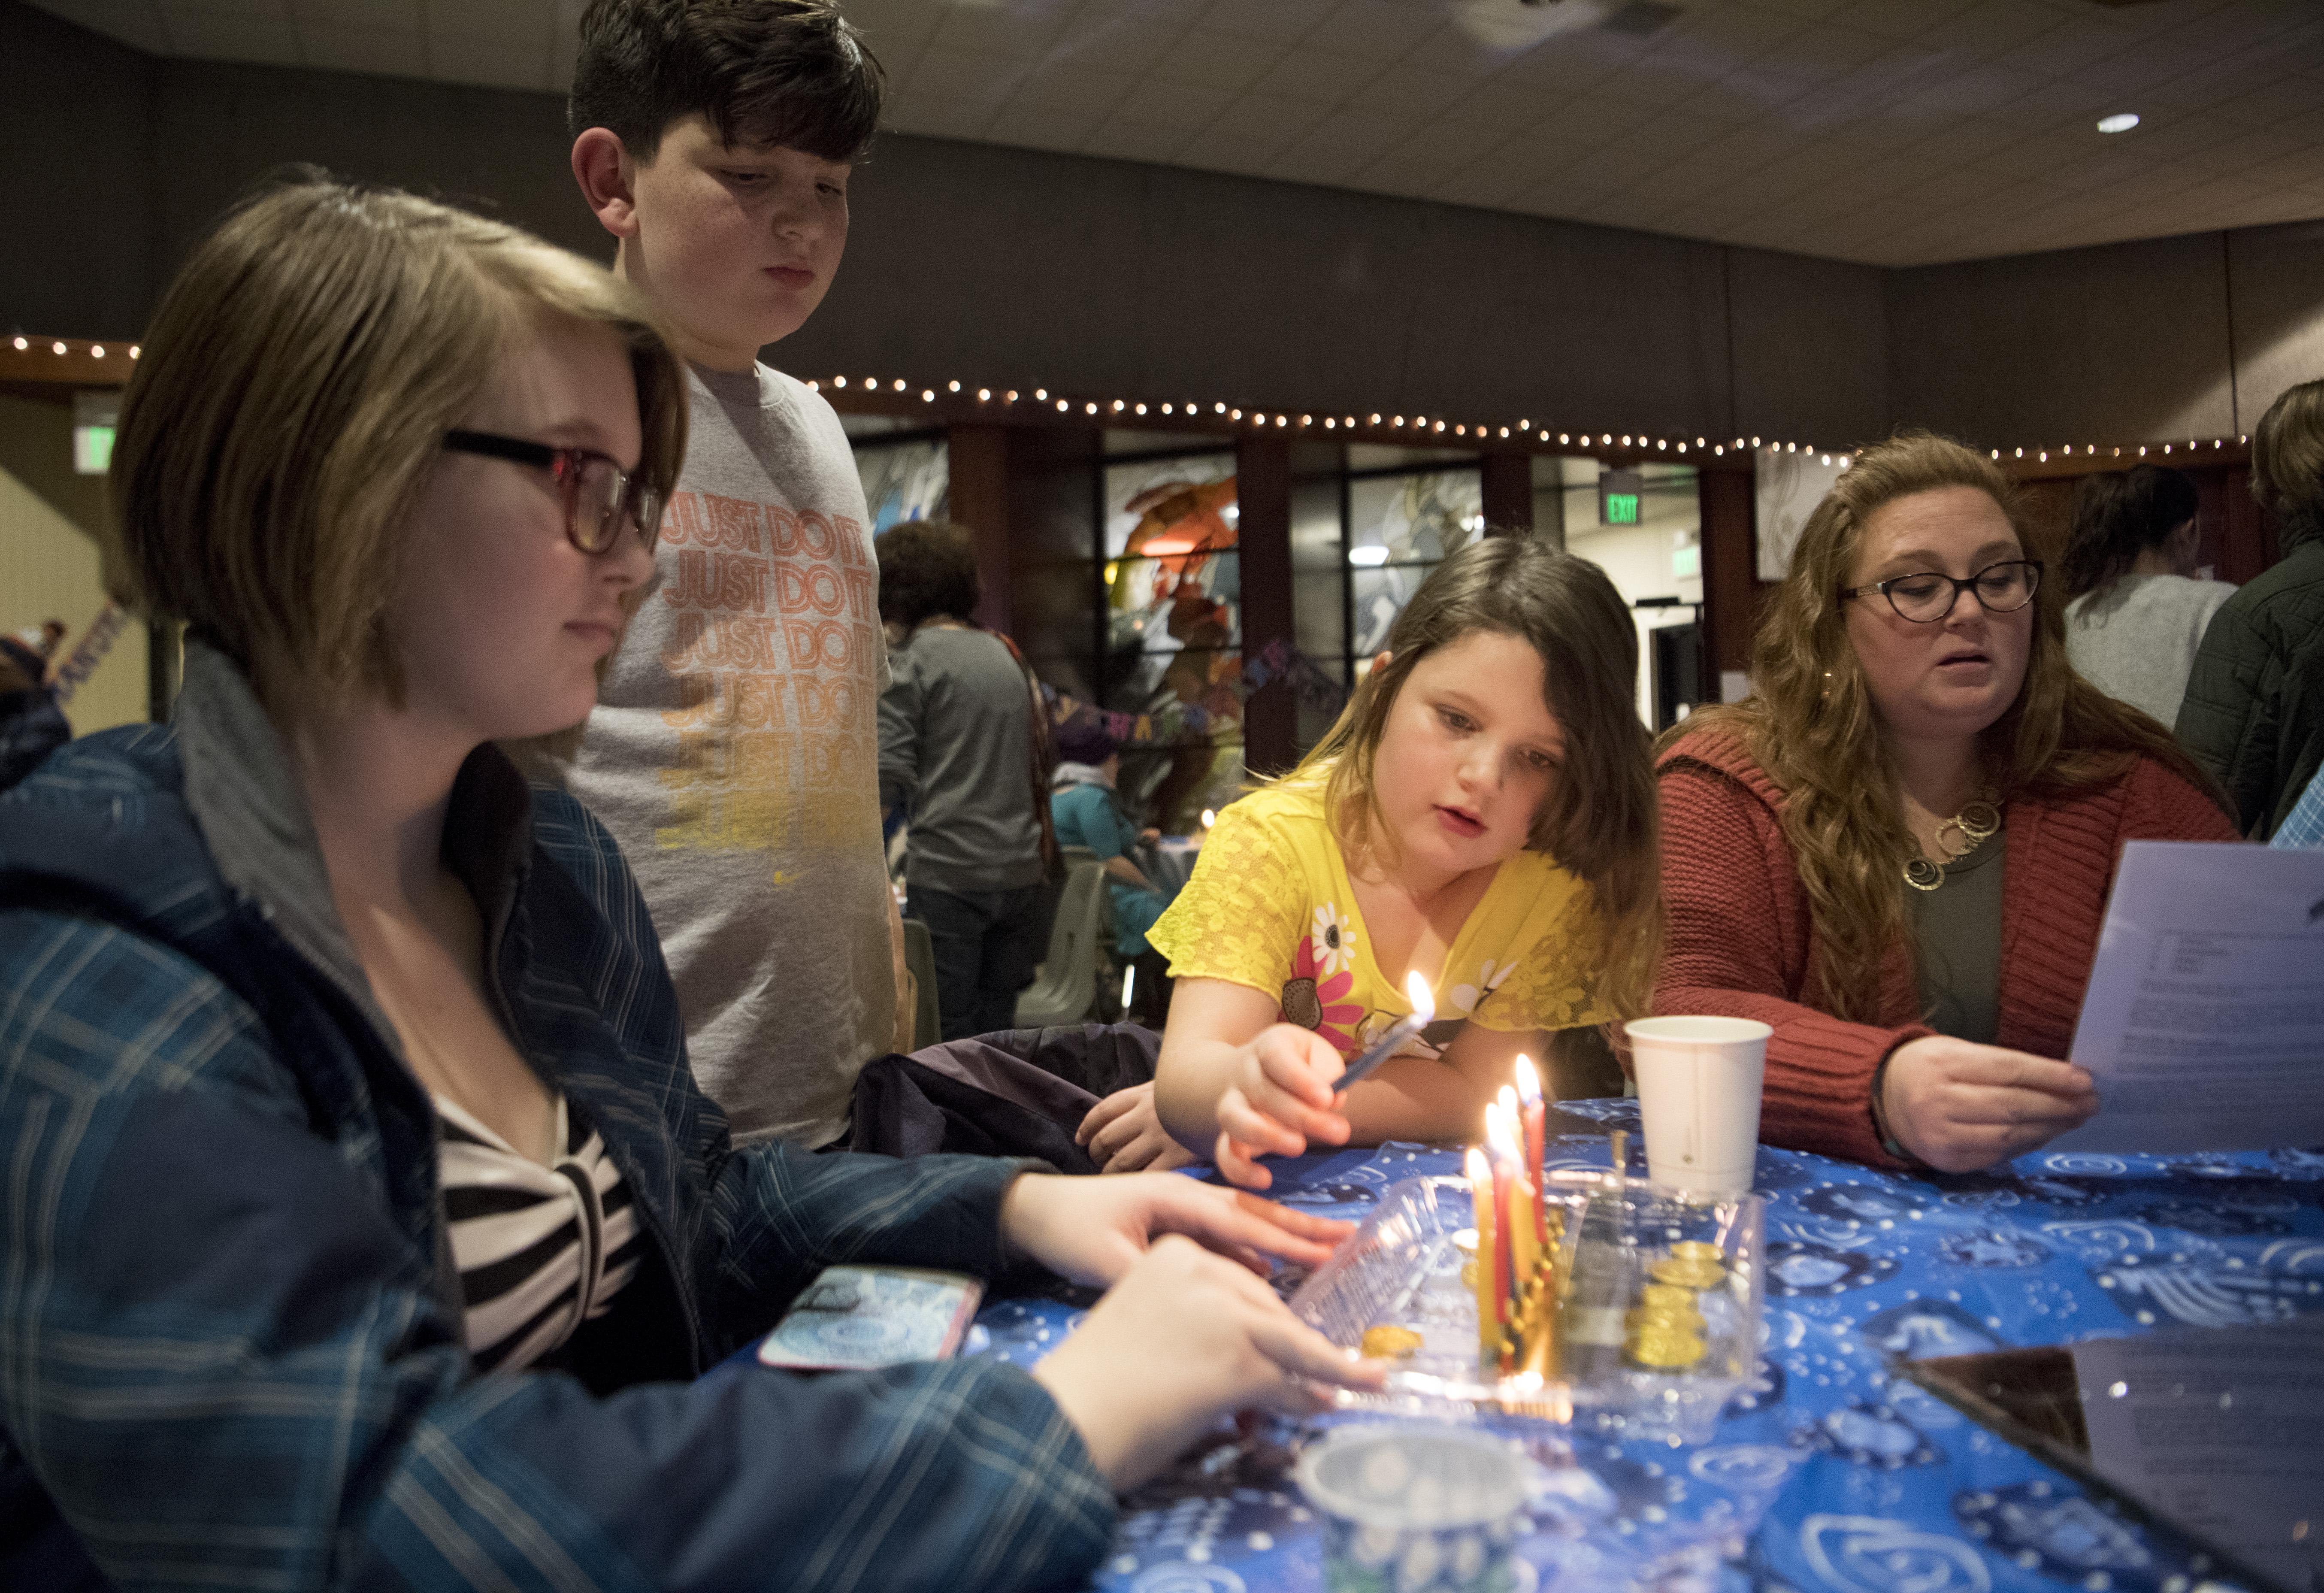 Hanukkah Party Celebrates Lighting Of The Menorah At